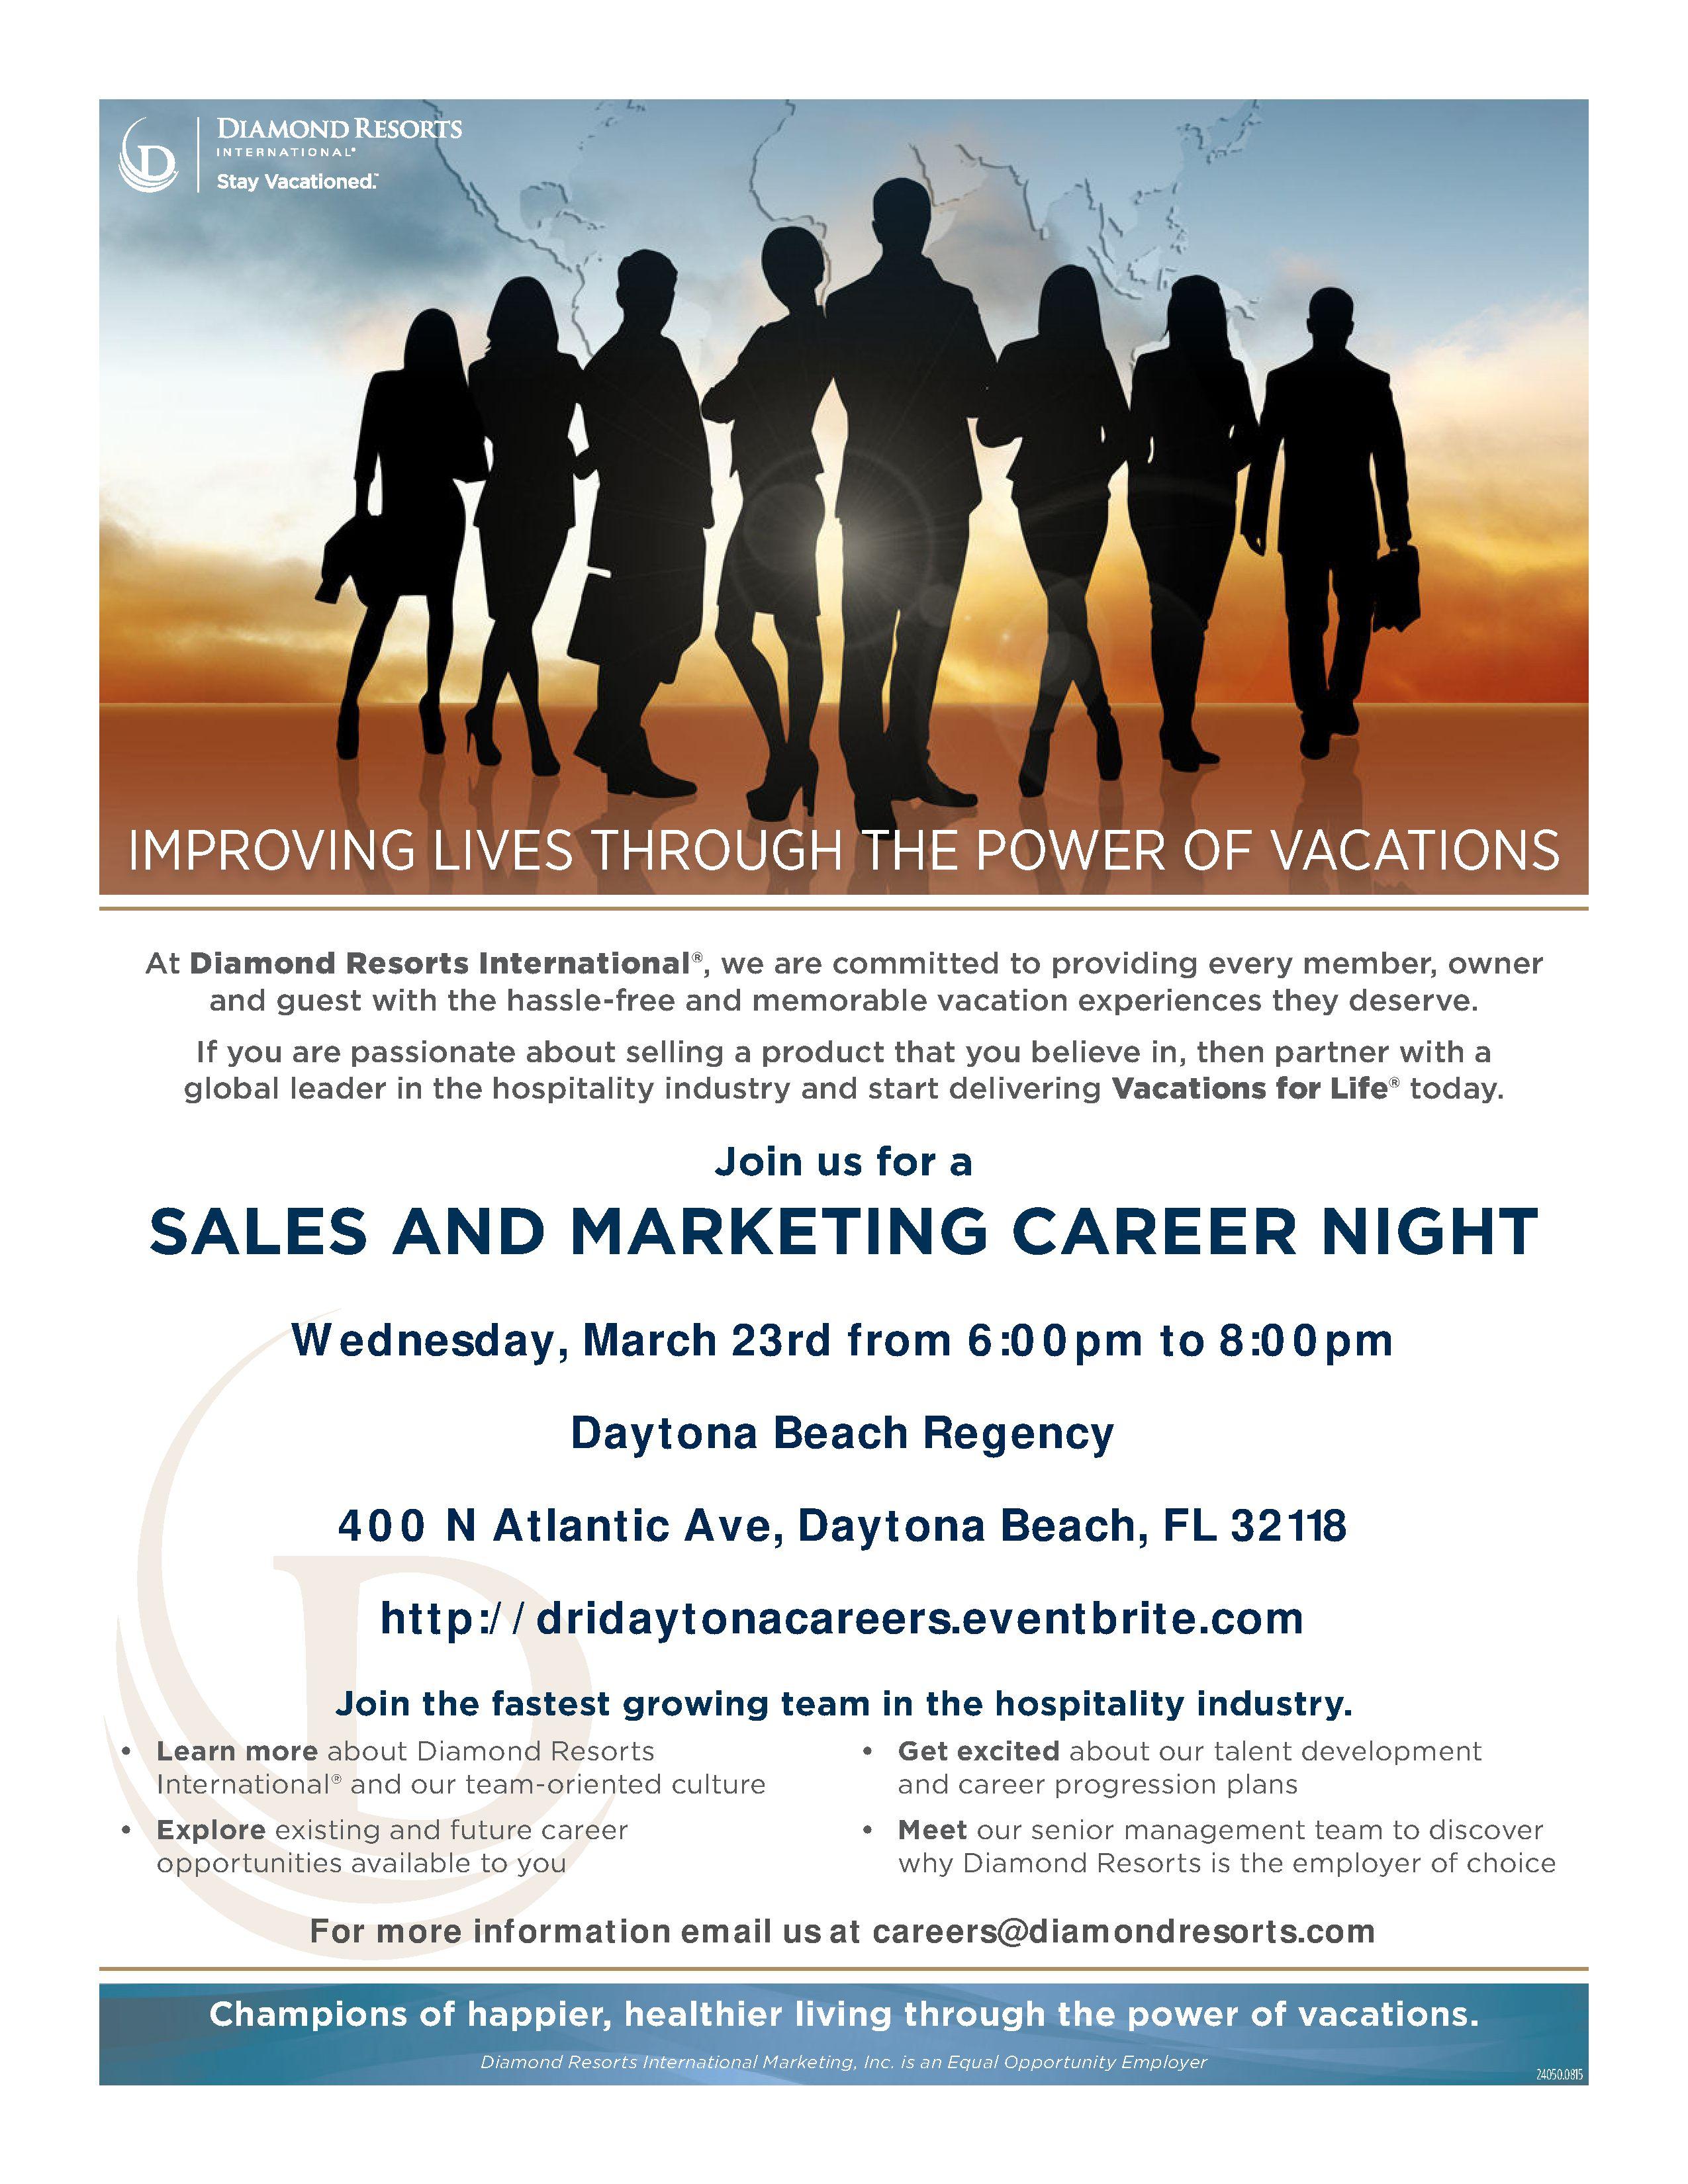 Daytona Beach Sales and Marketing Career Night